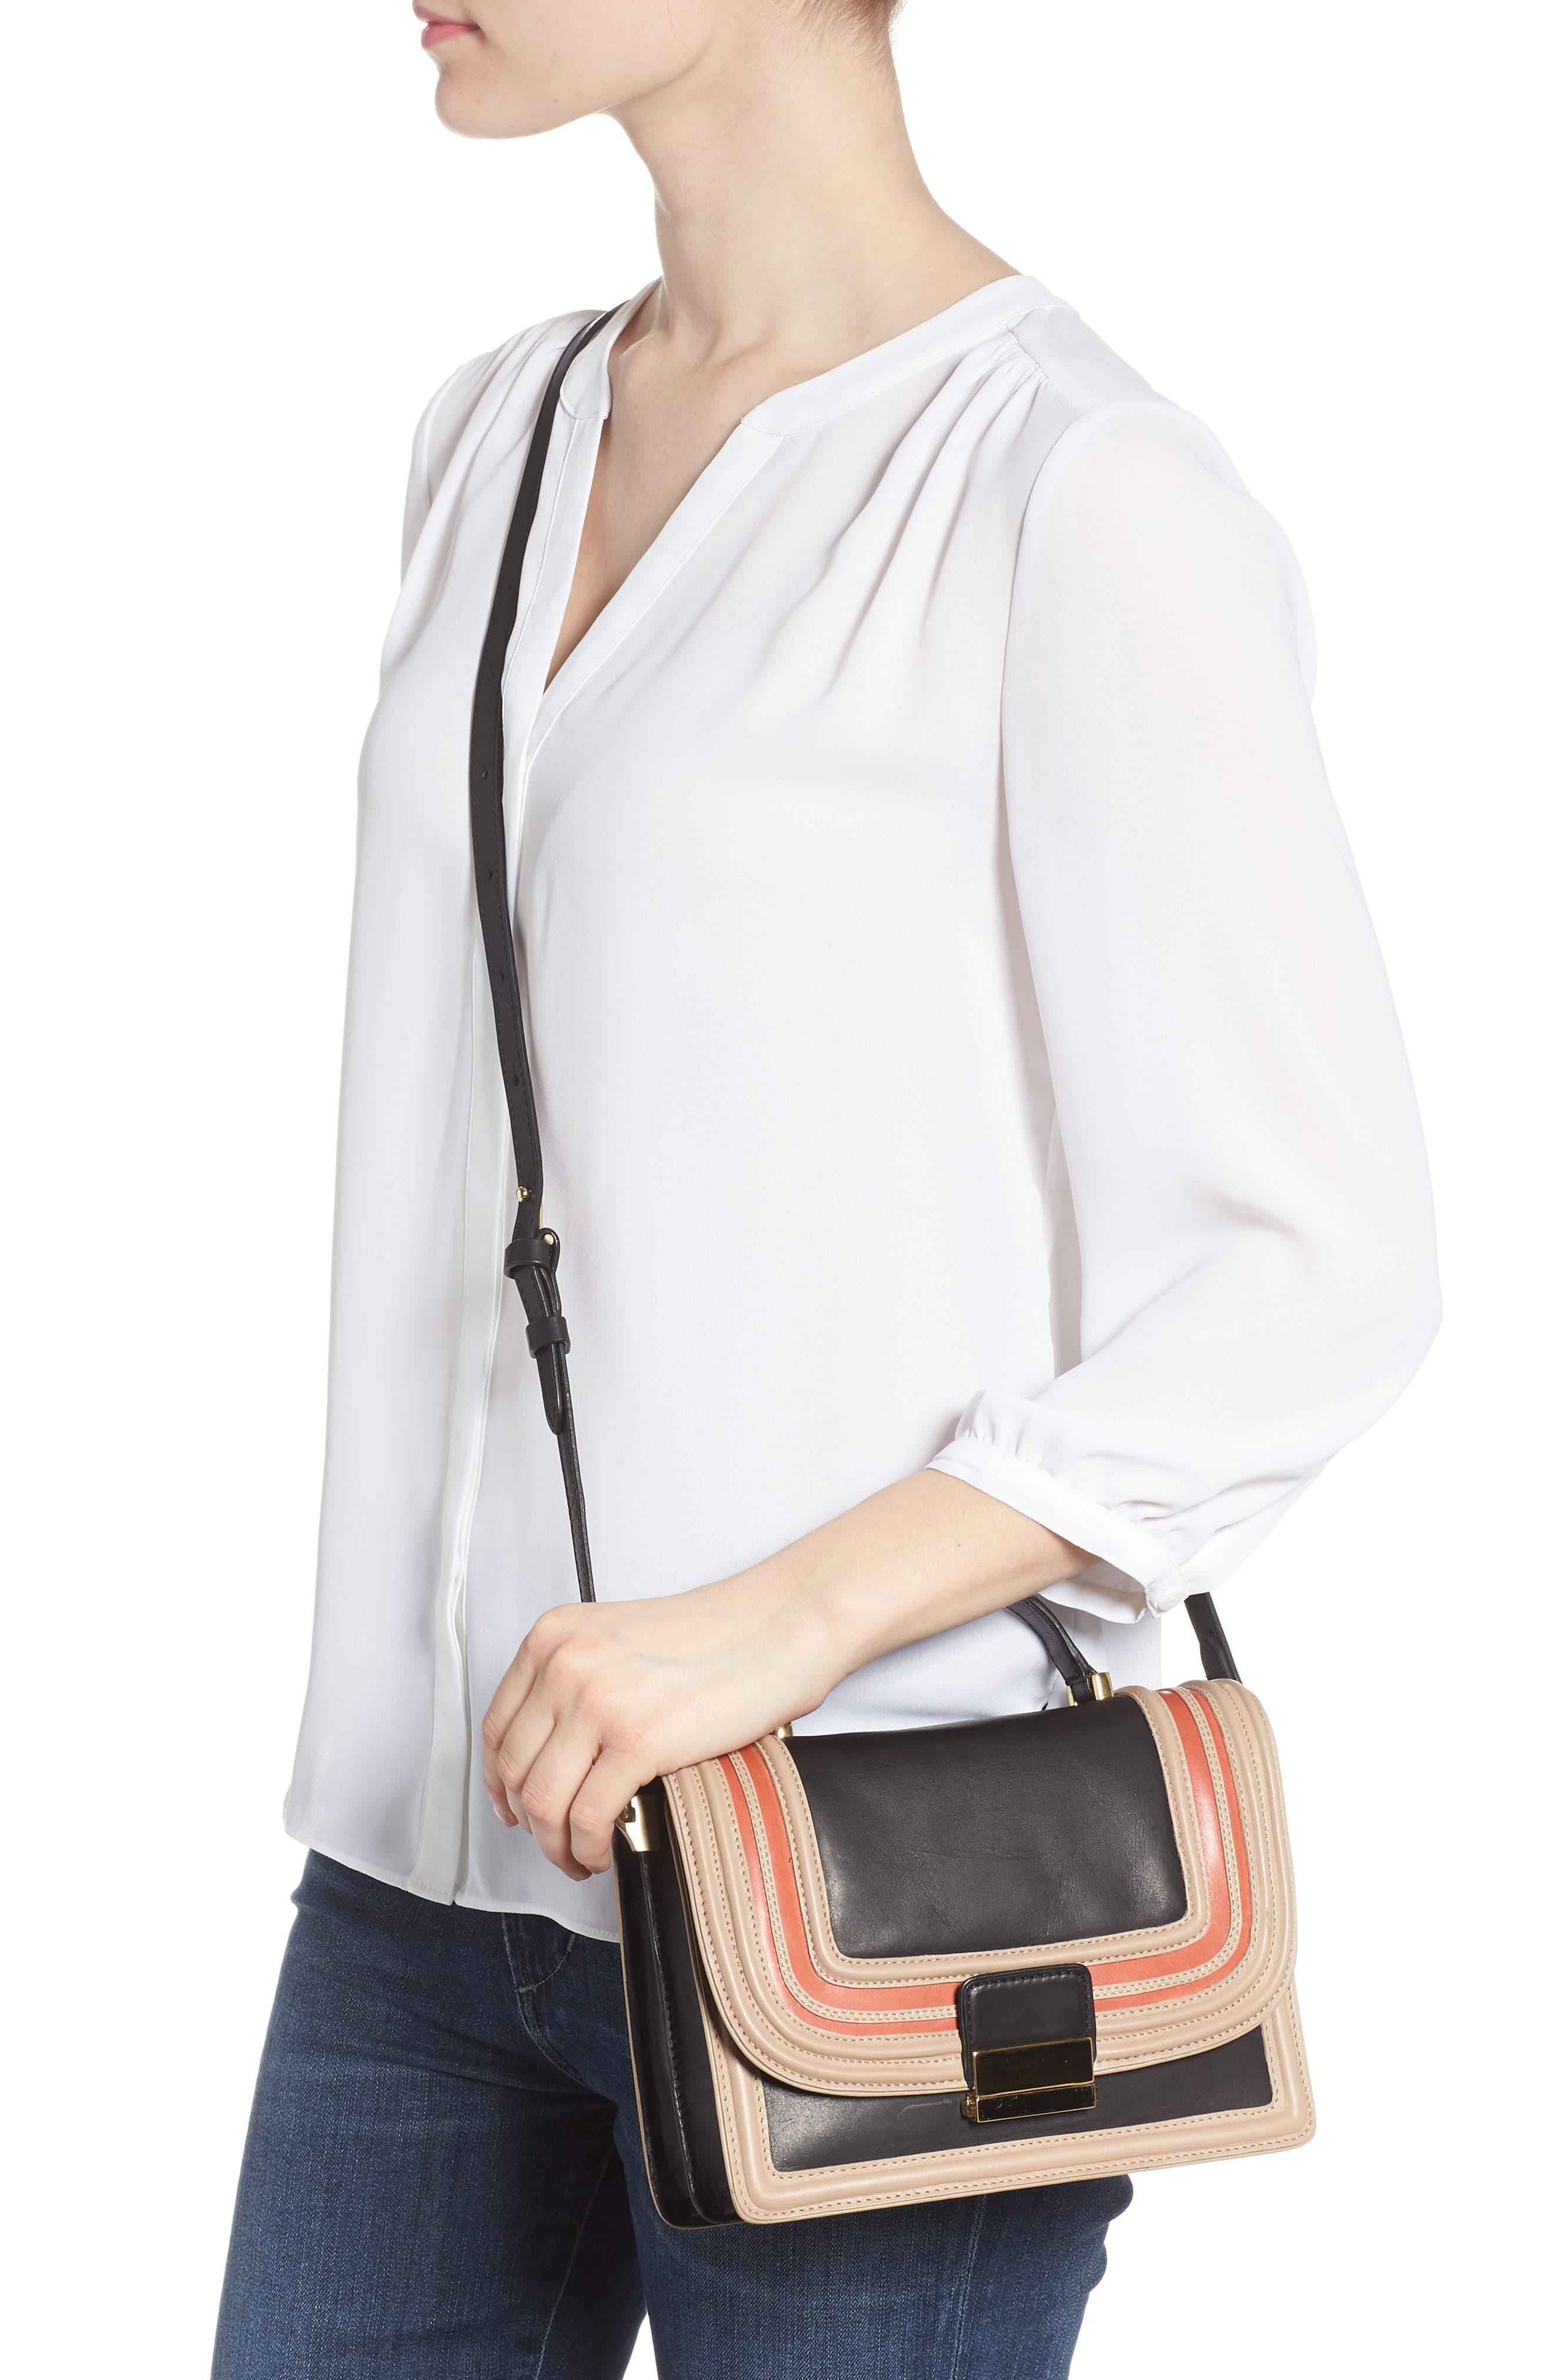 Small Square Top Handle Handbag,                             Alternate thumbnail 2, color,                             Black